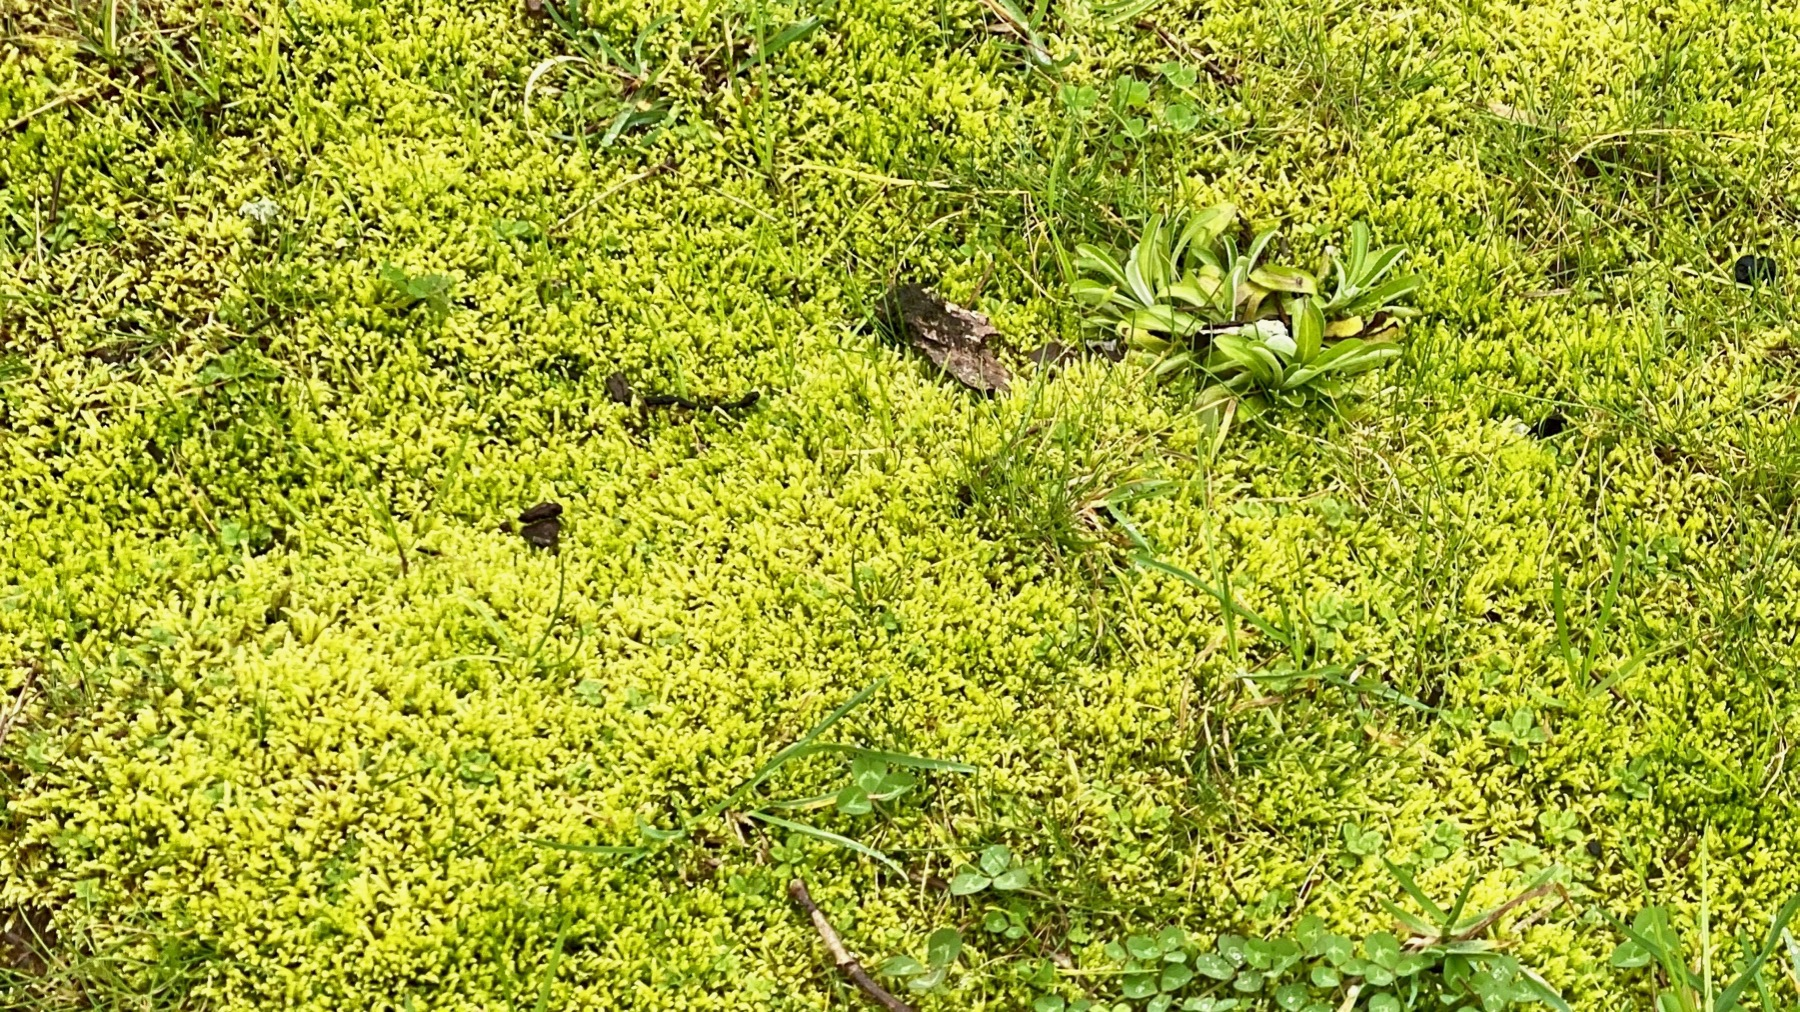 Moss vibrant